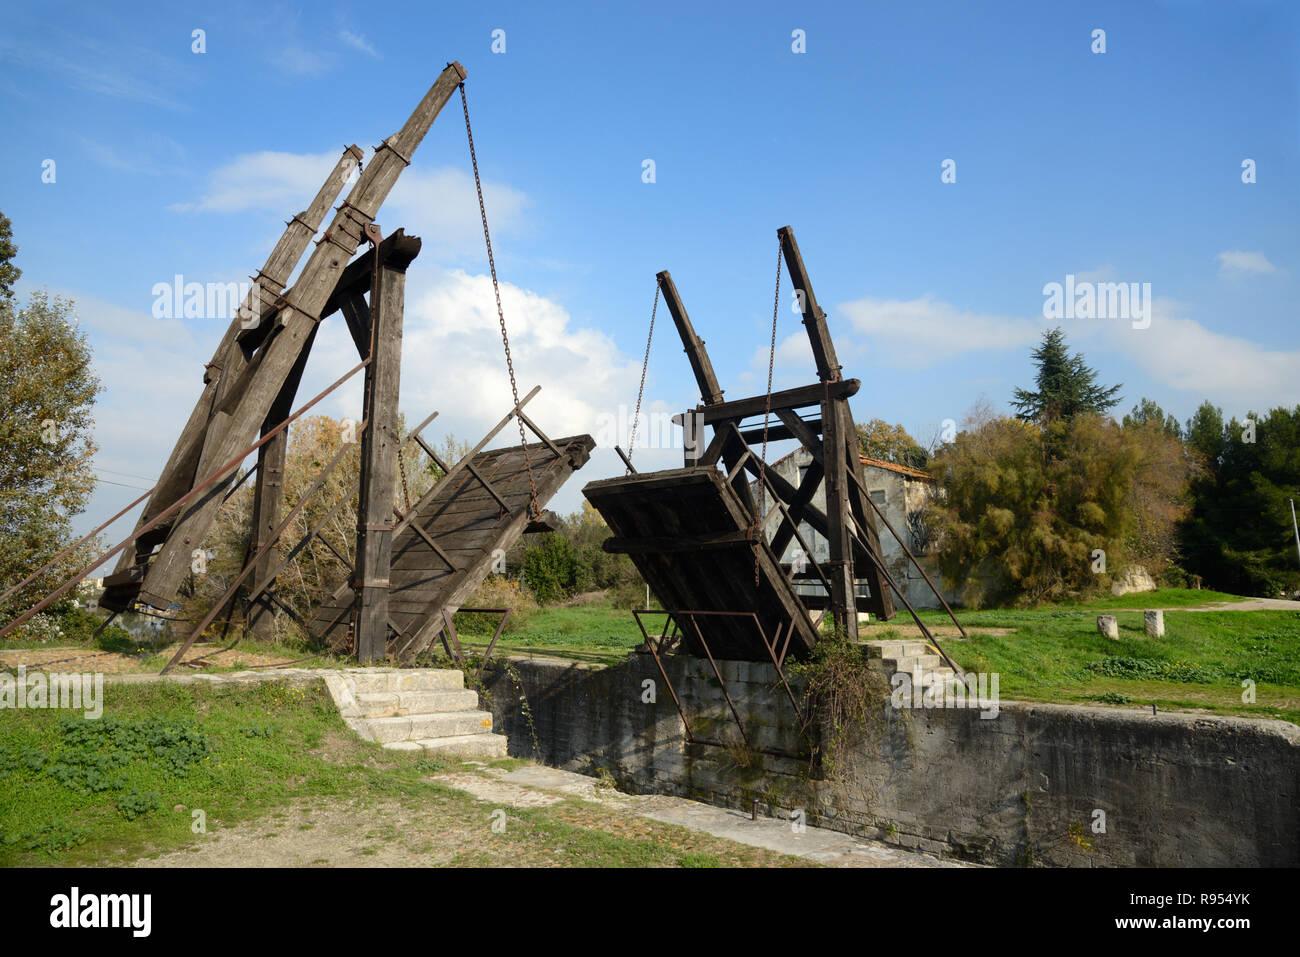 Langlois Bridge or Drawbridge aka Pont de Langlois or Van Gogh Bridge over a Canal at Arles Provence France - Stock Image